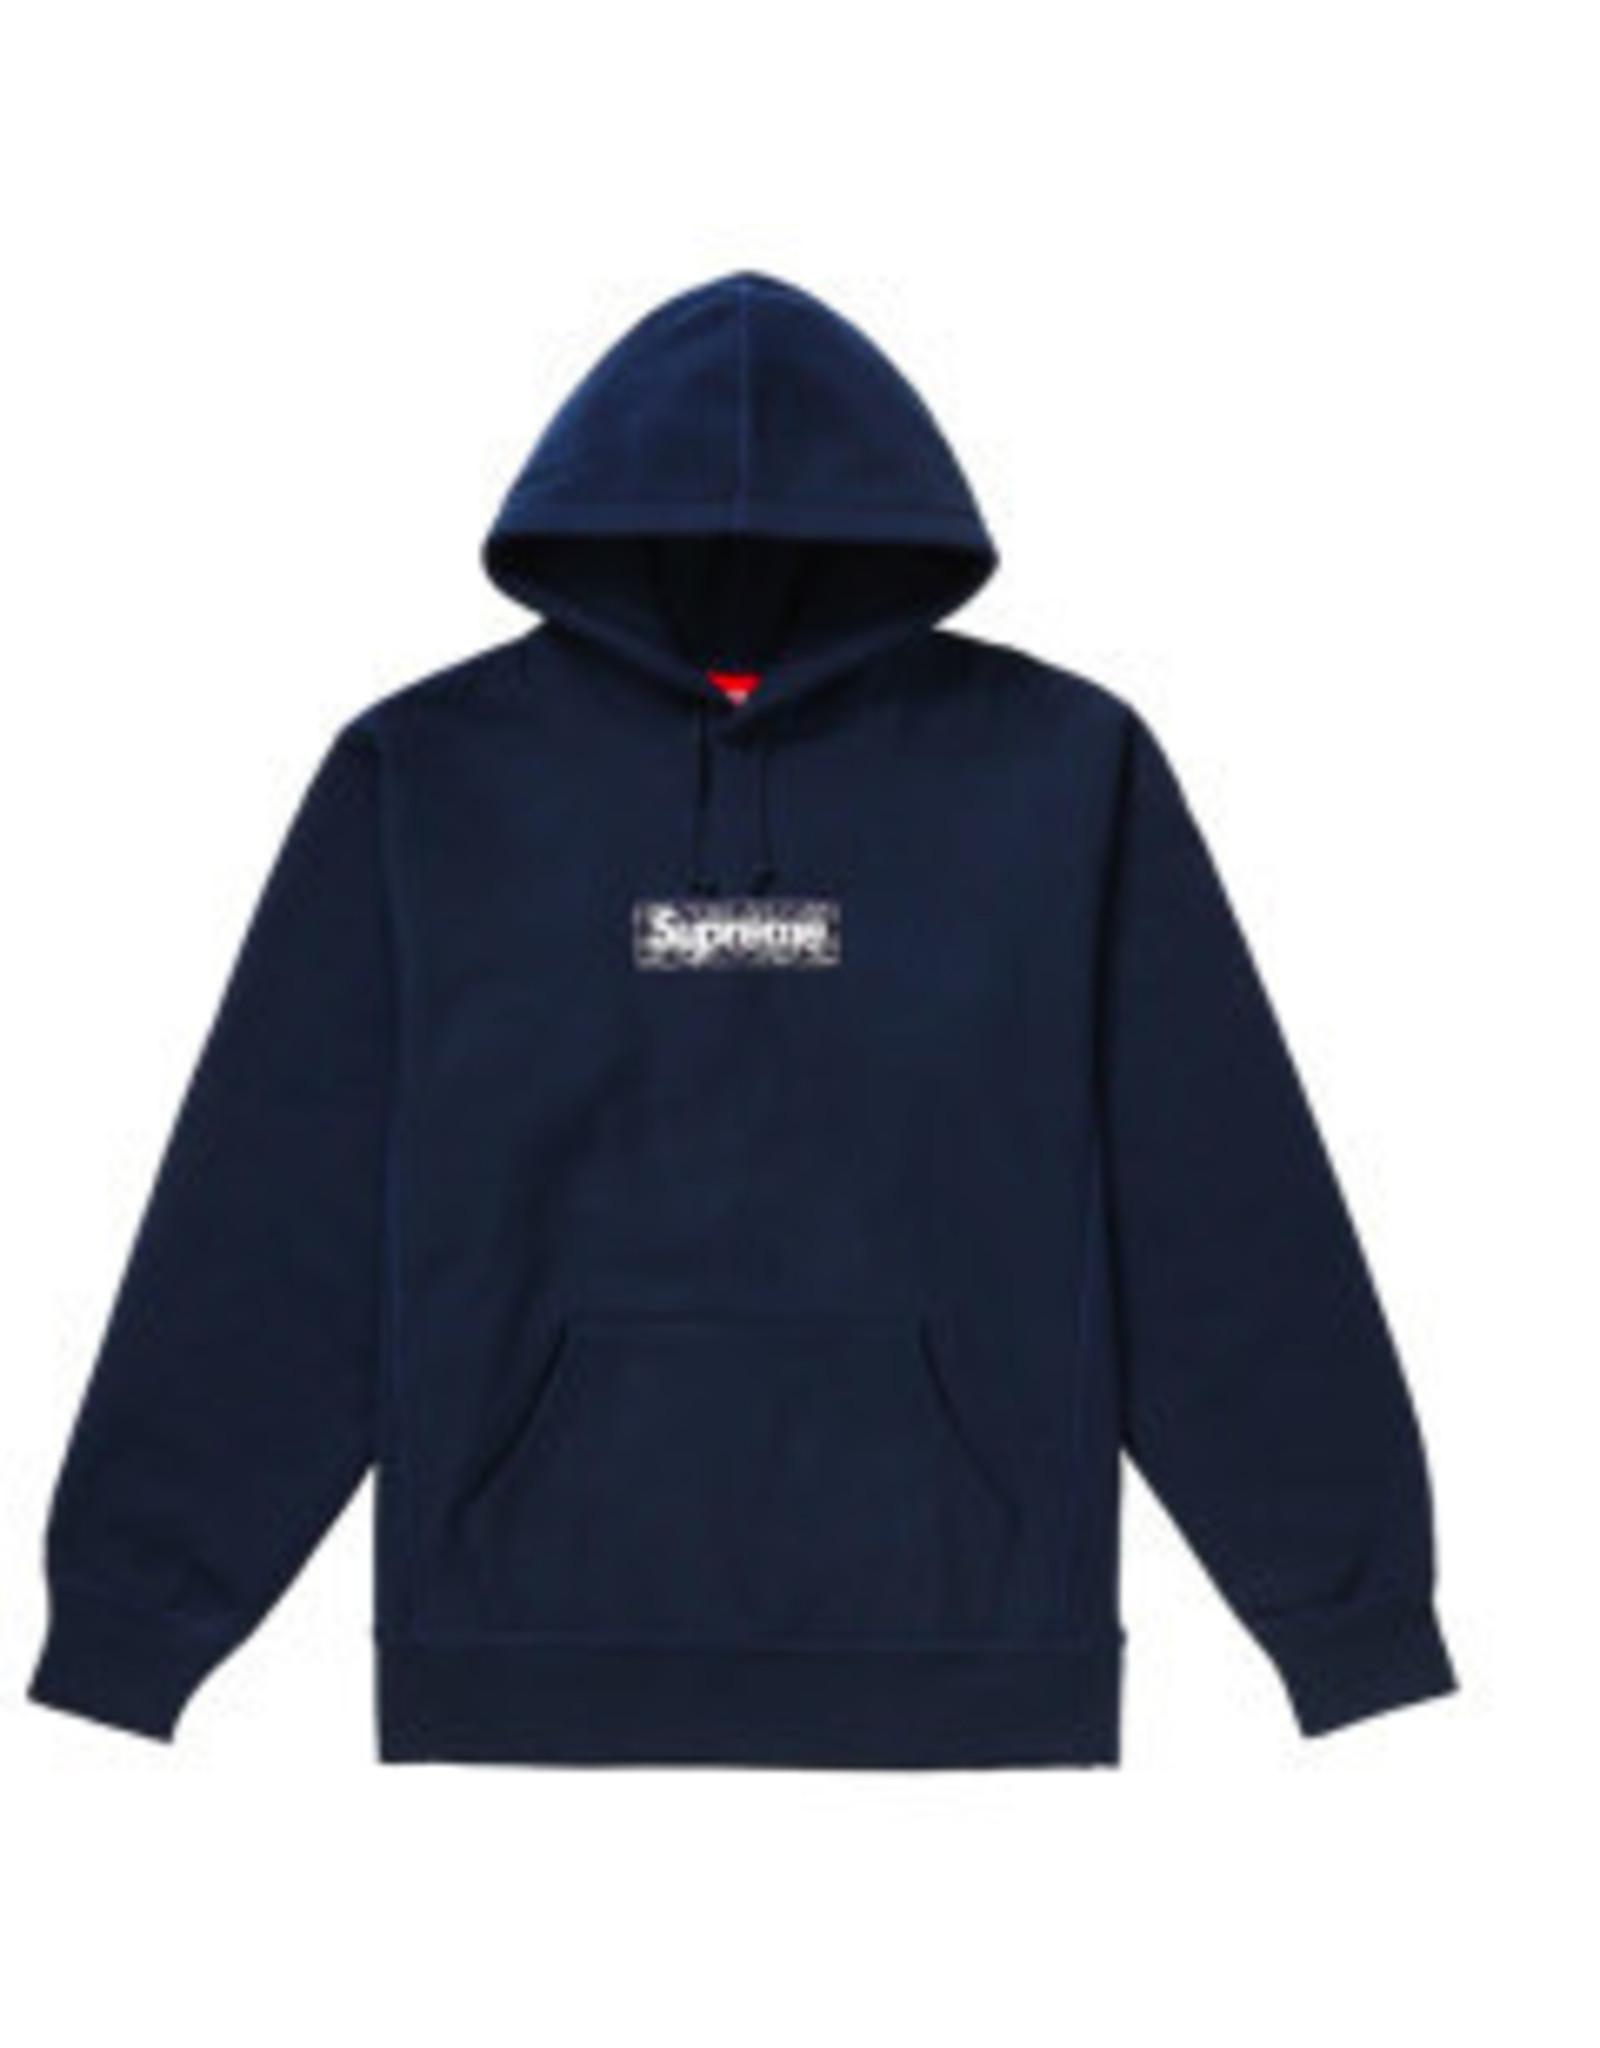 SUPREME DOUSED-Supreme Bandana Box Logo Hooded Sweatshirt